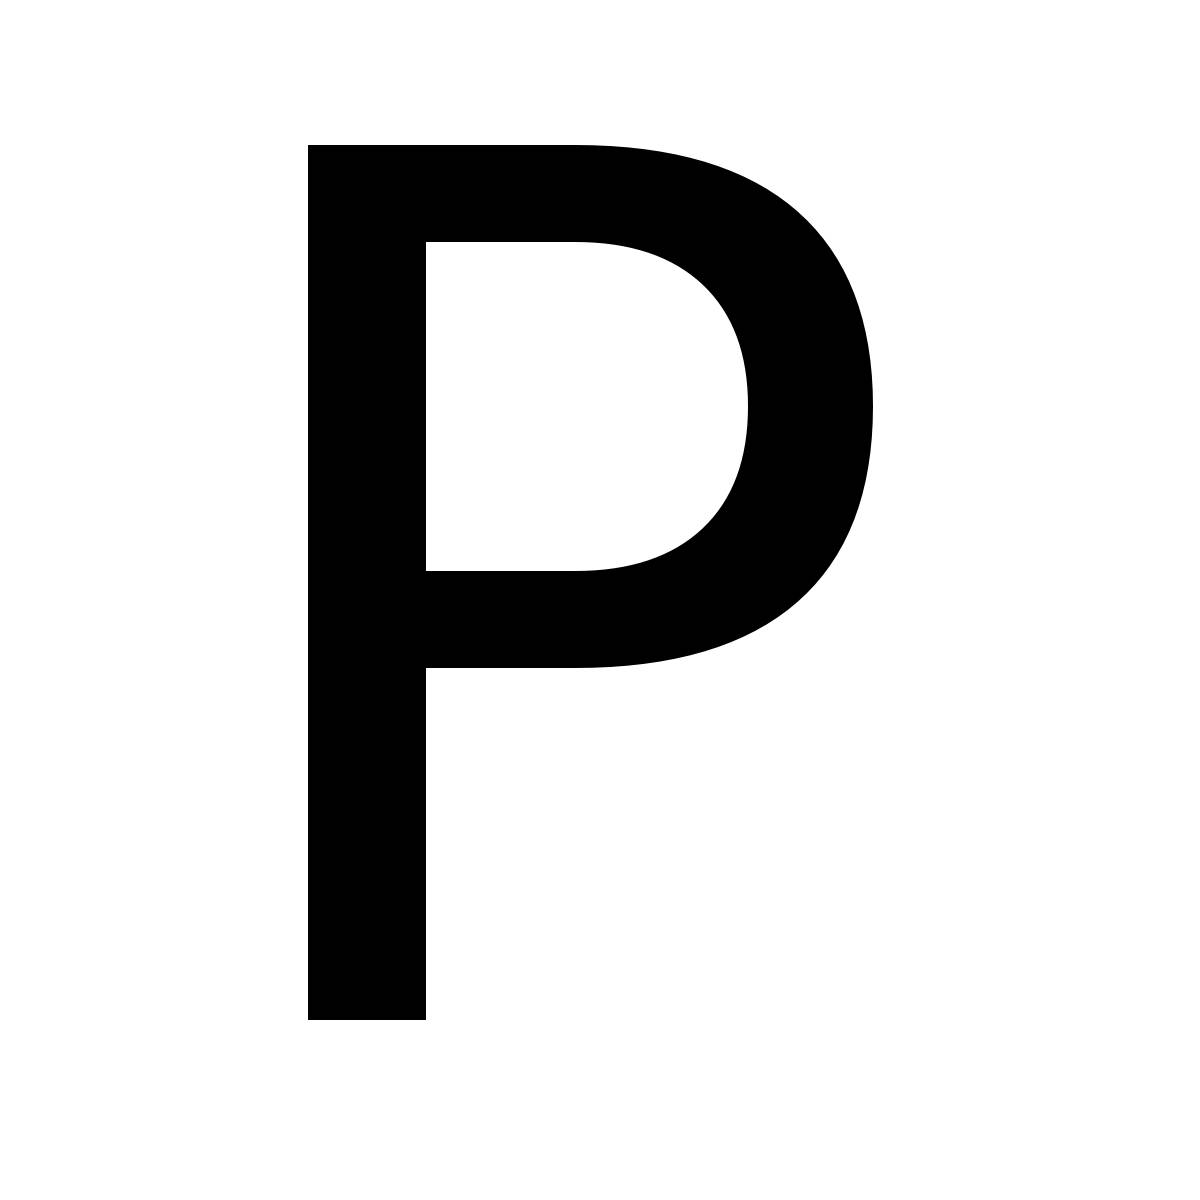 P&l Report Template